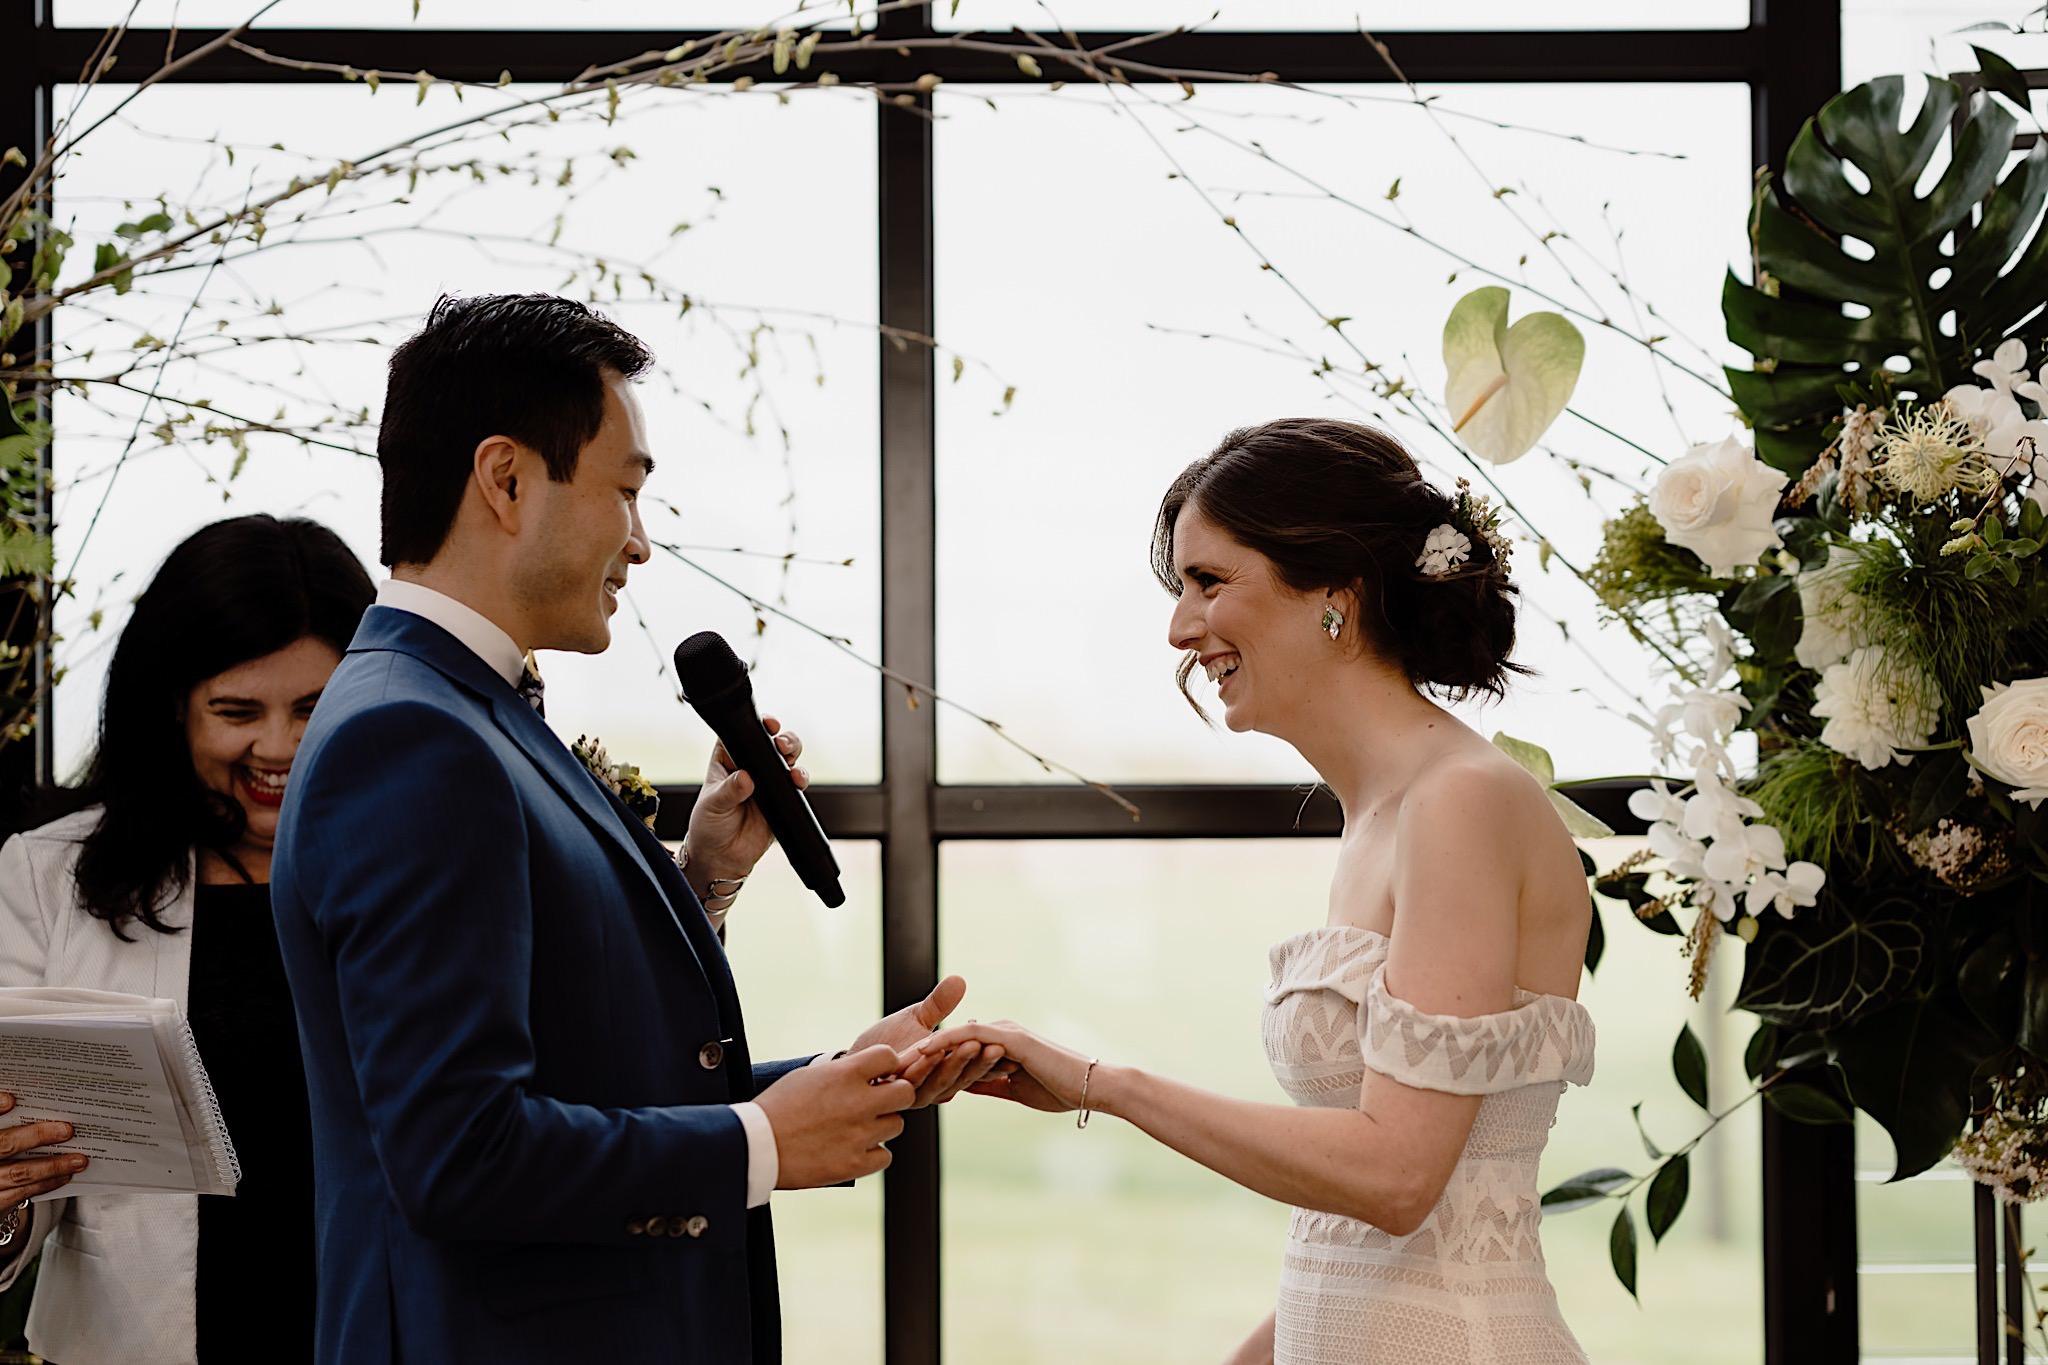 Zonzo Estate Winery Yarra Valley Wedding20.jpg